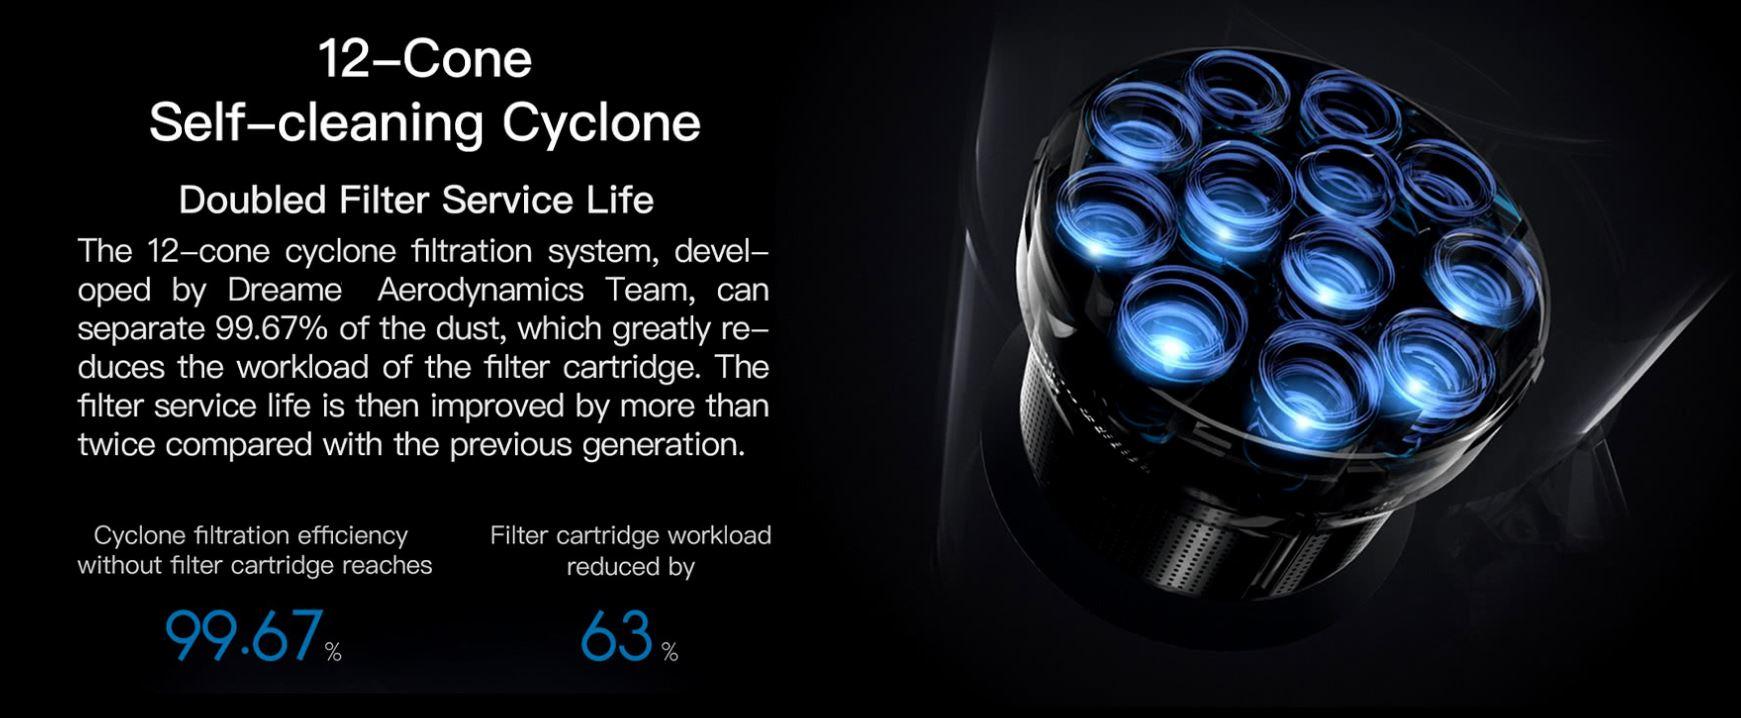 Promocja Dreame V11 na geekbuying.com - system cyklonowy